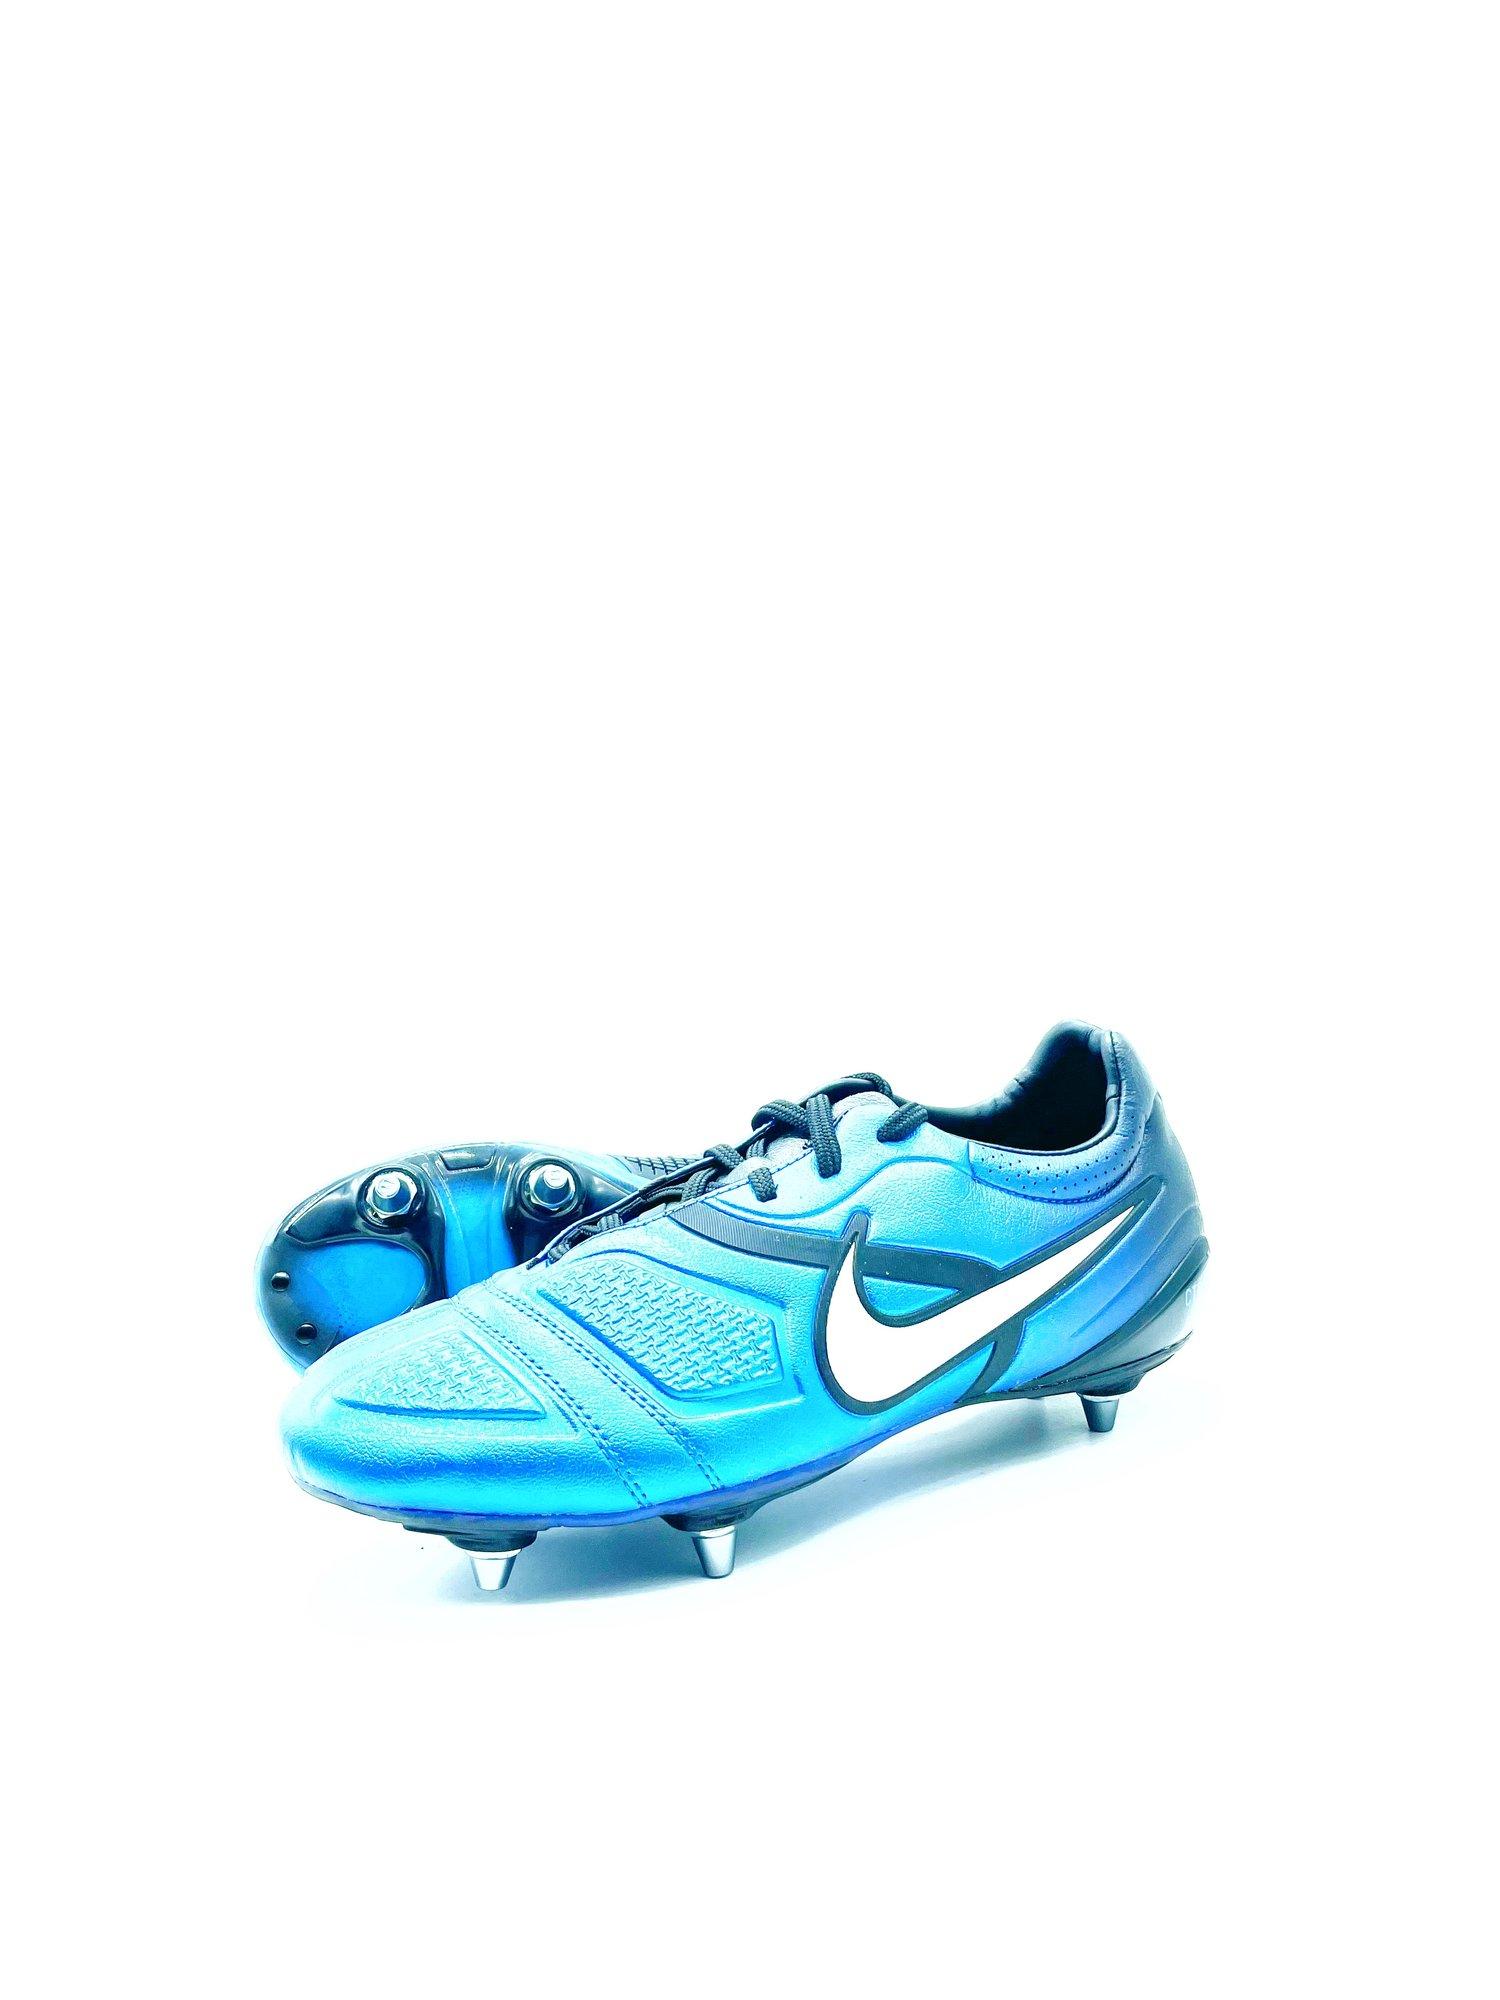 Image of Nike Ctr360 Maestri Sg